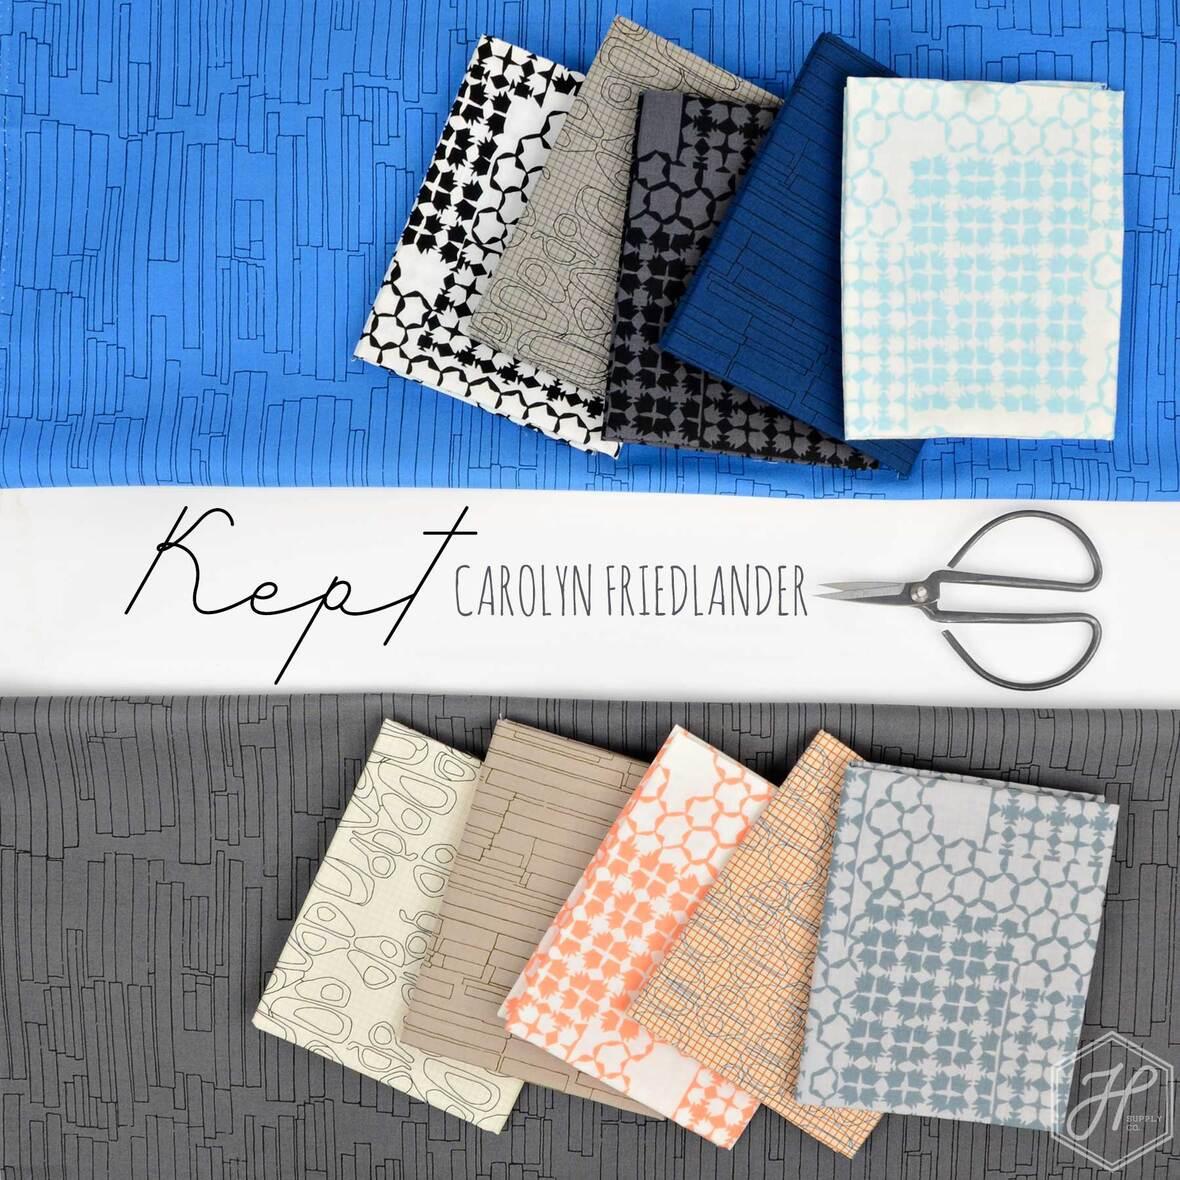 Kept-Carolyn-Friedlander-fabric-from-Robert-Kaufman-at-Hawthorne-Supply-Co